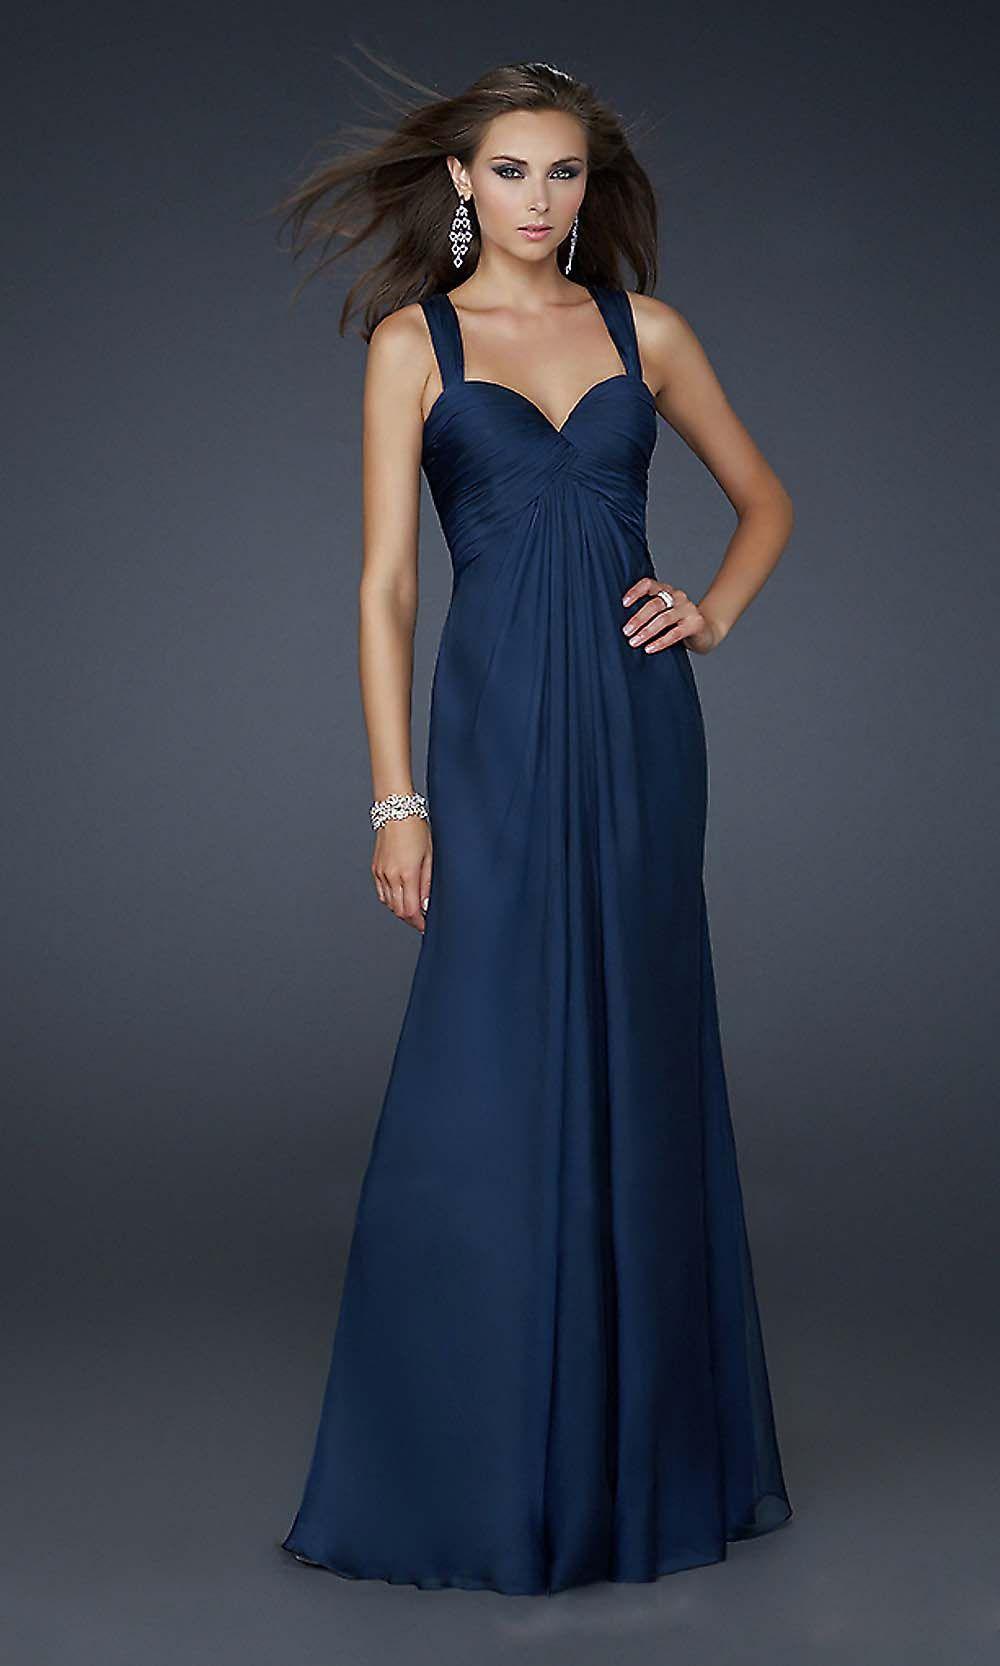 Off shoulder prom dress chiffon prom dresses cheap prom dresses